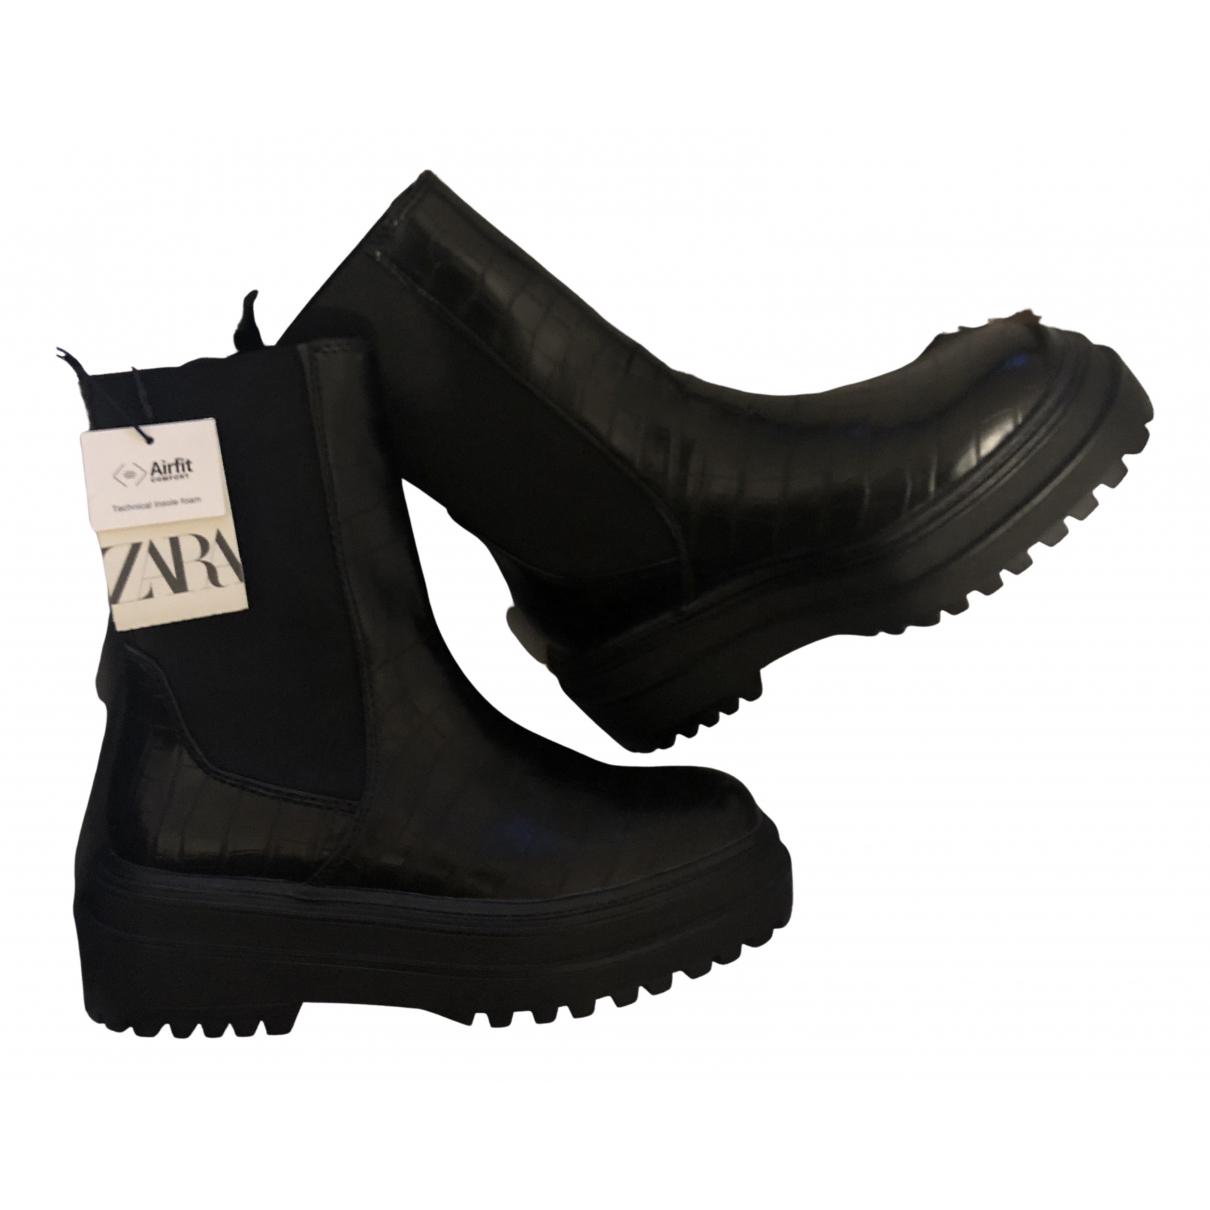 Zara N Black Leather Boots for Women 37 EU